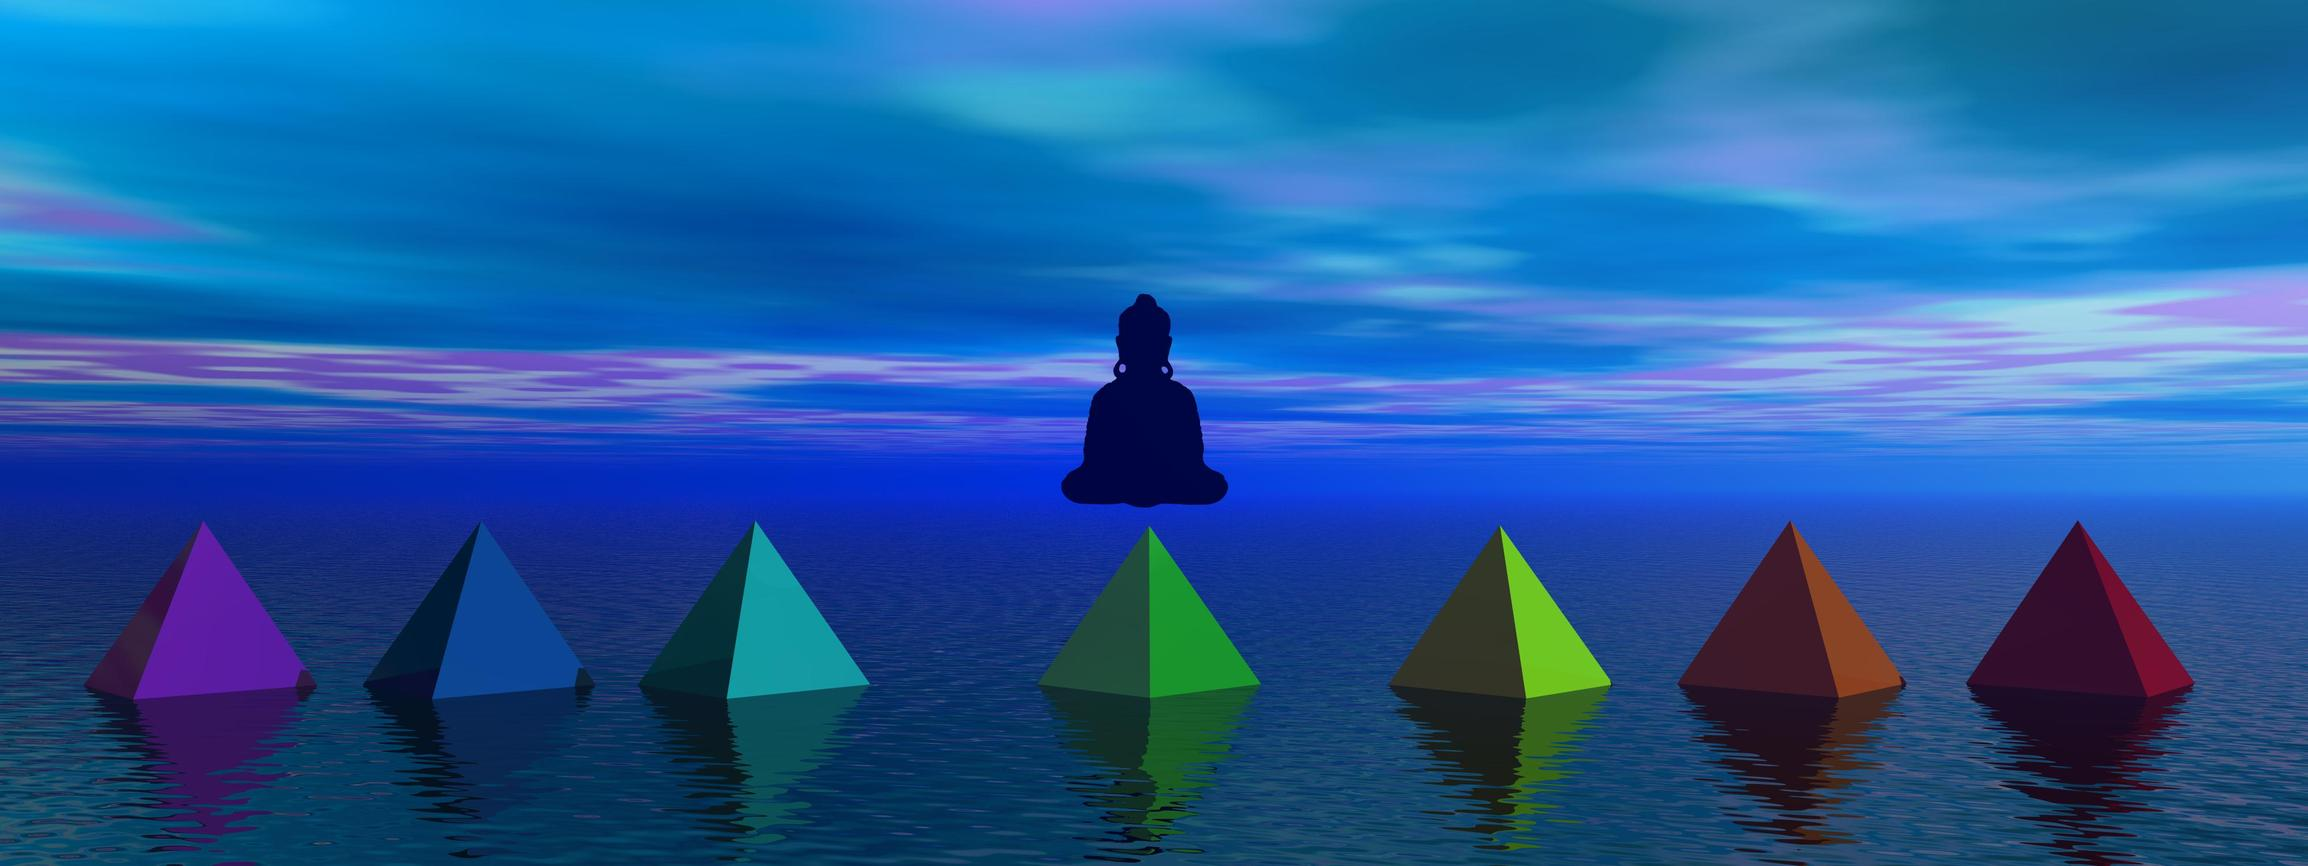 Meditationsabend Individualitaet finden Chakras